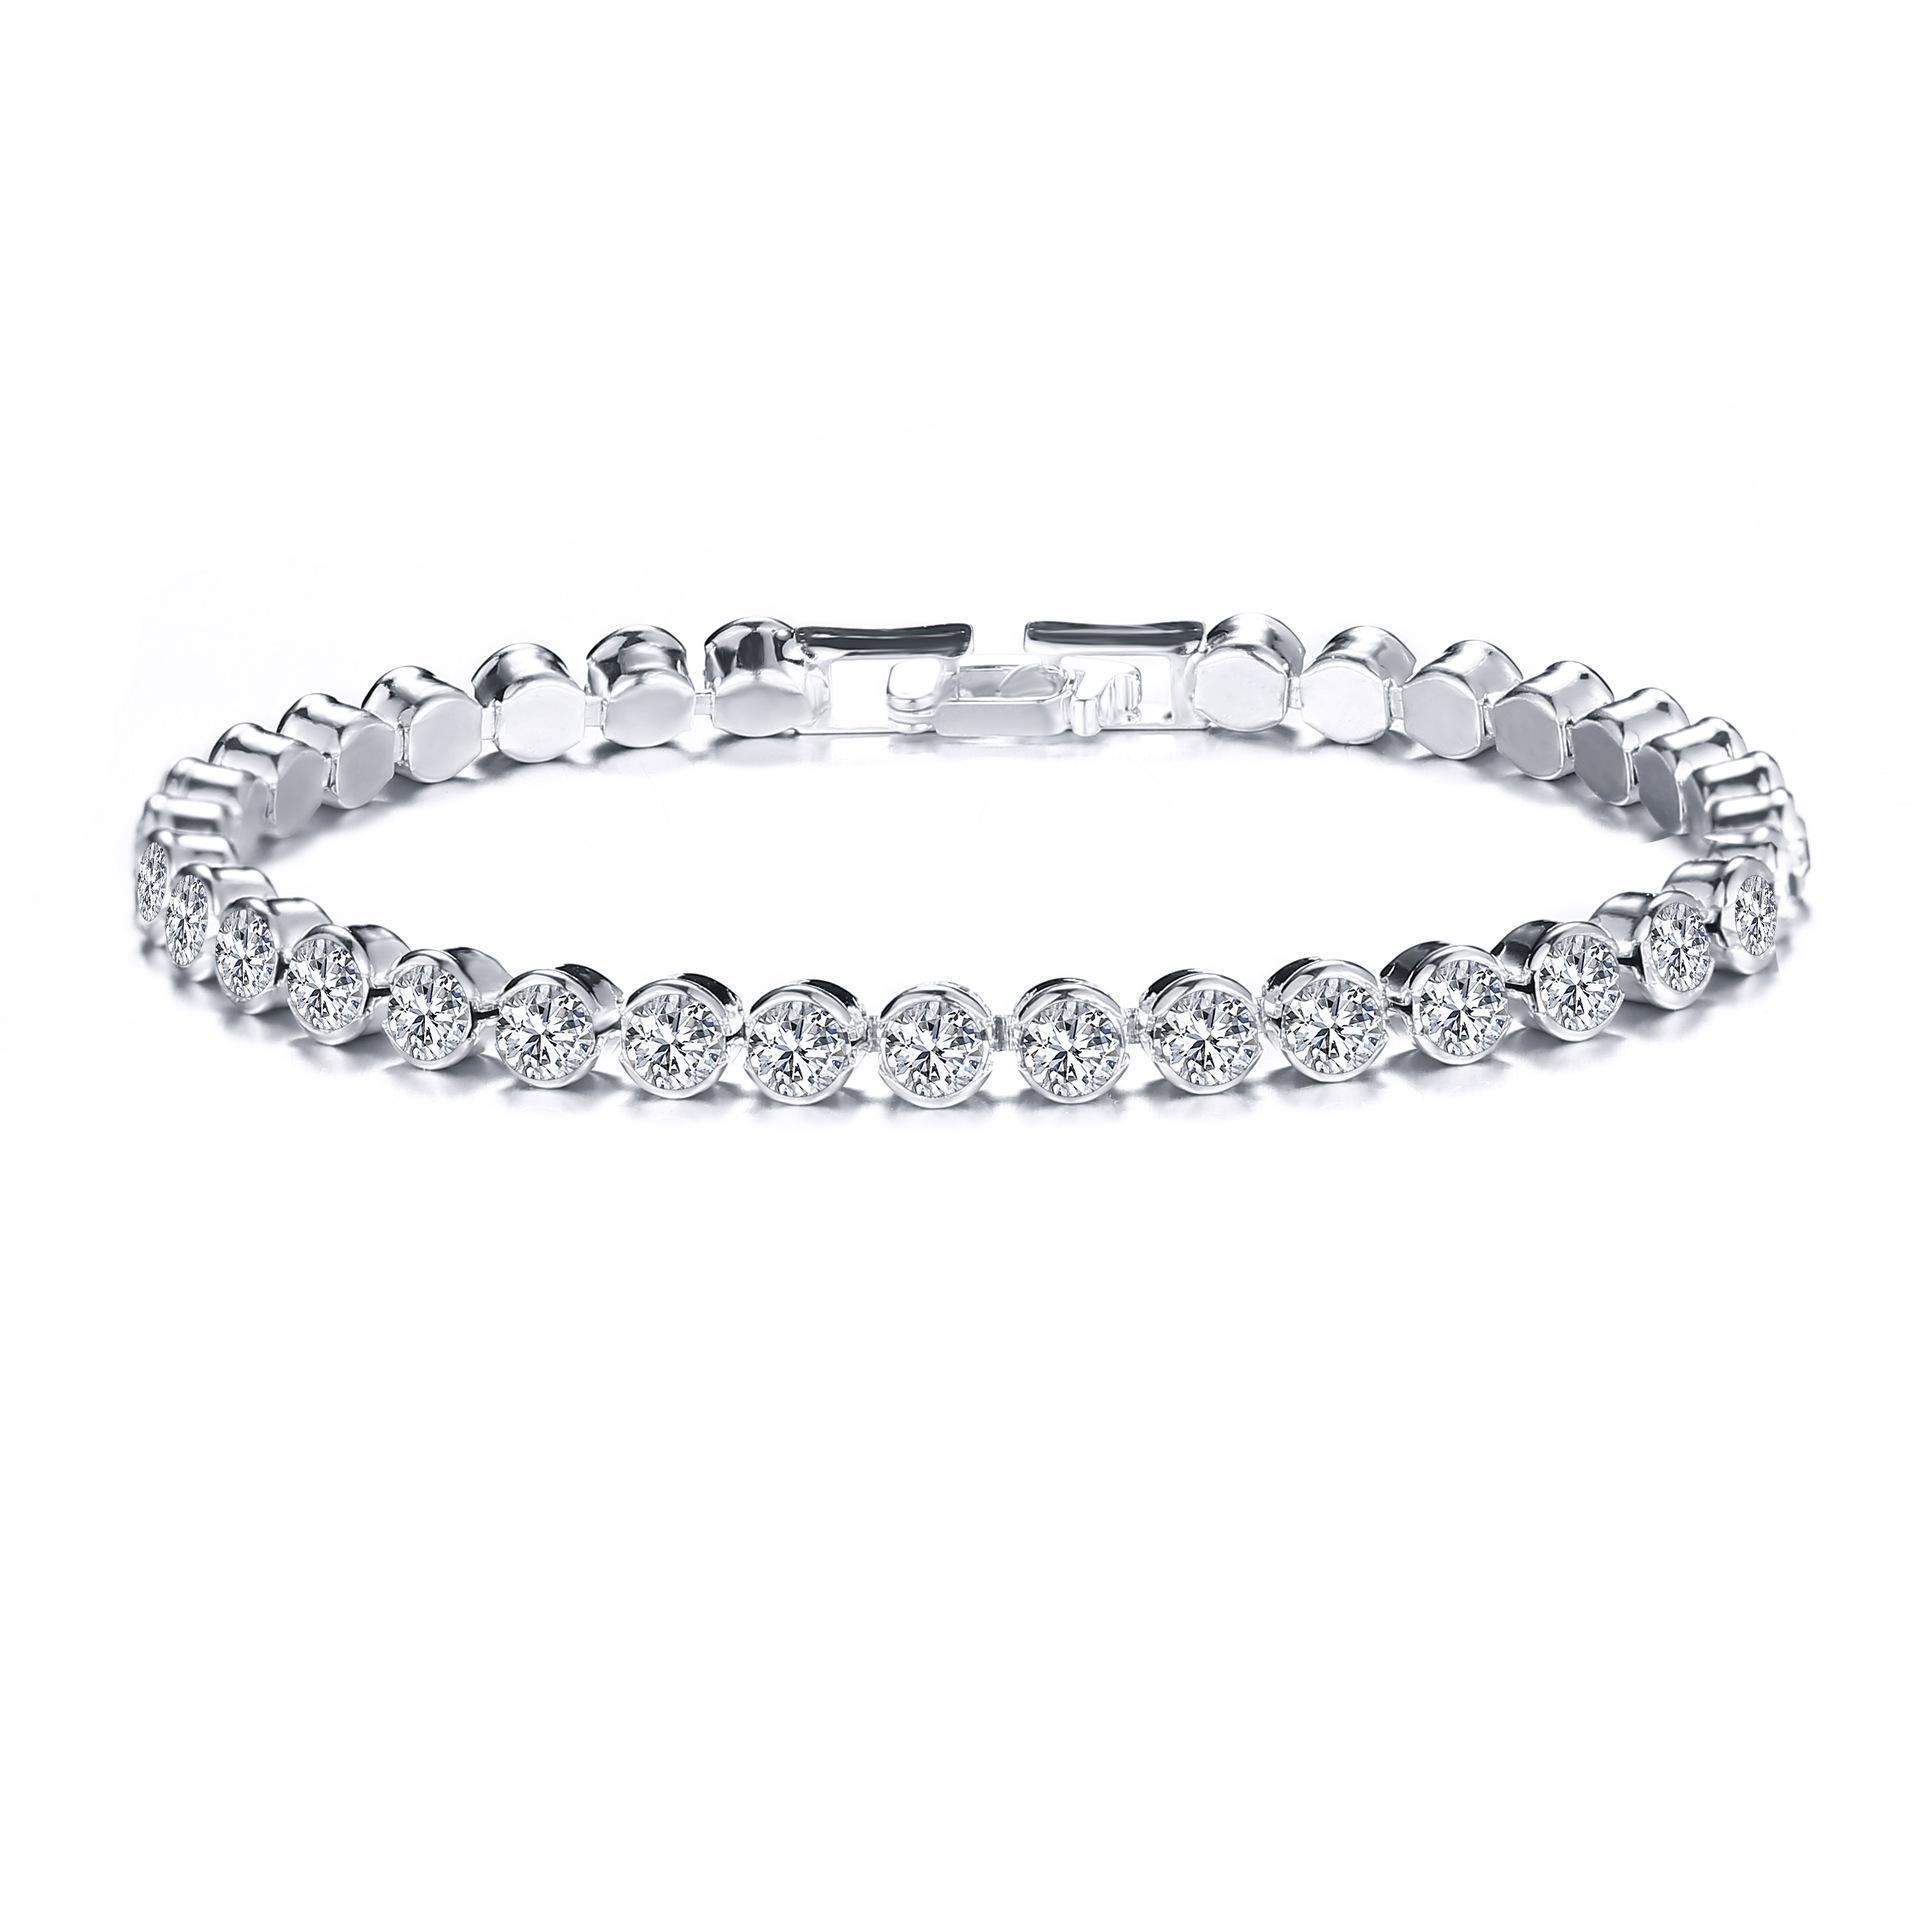 Zirkonia Tennis Armbänder Iced Out Kette Kristall Hochzeit Armband für Frauen Männer Gold-Silber-Farben-Armband